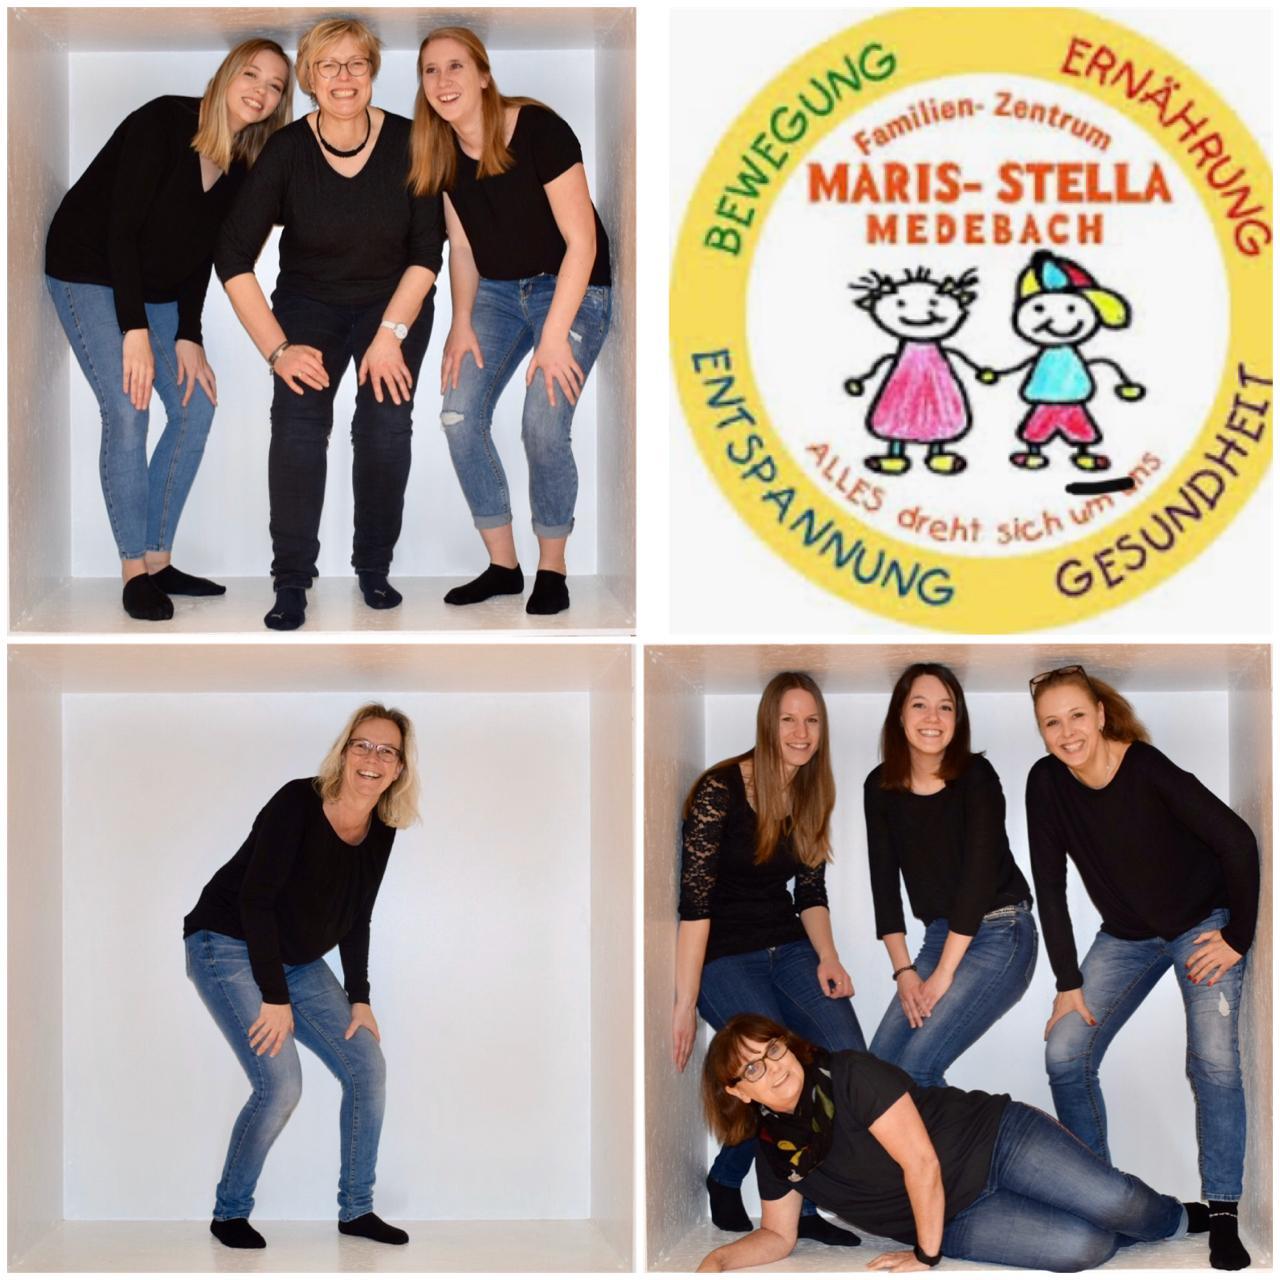 Team Maris Stella